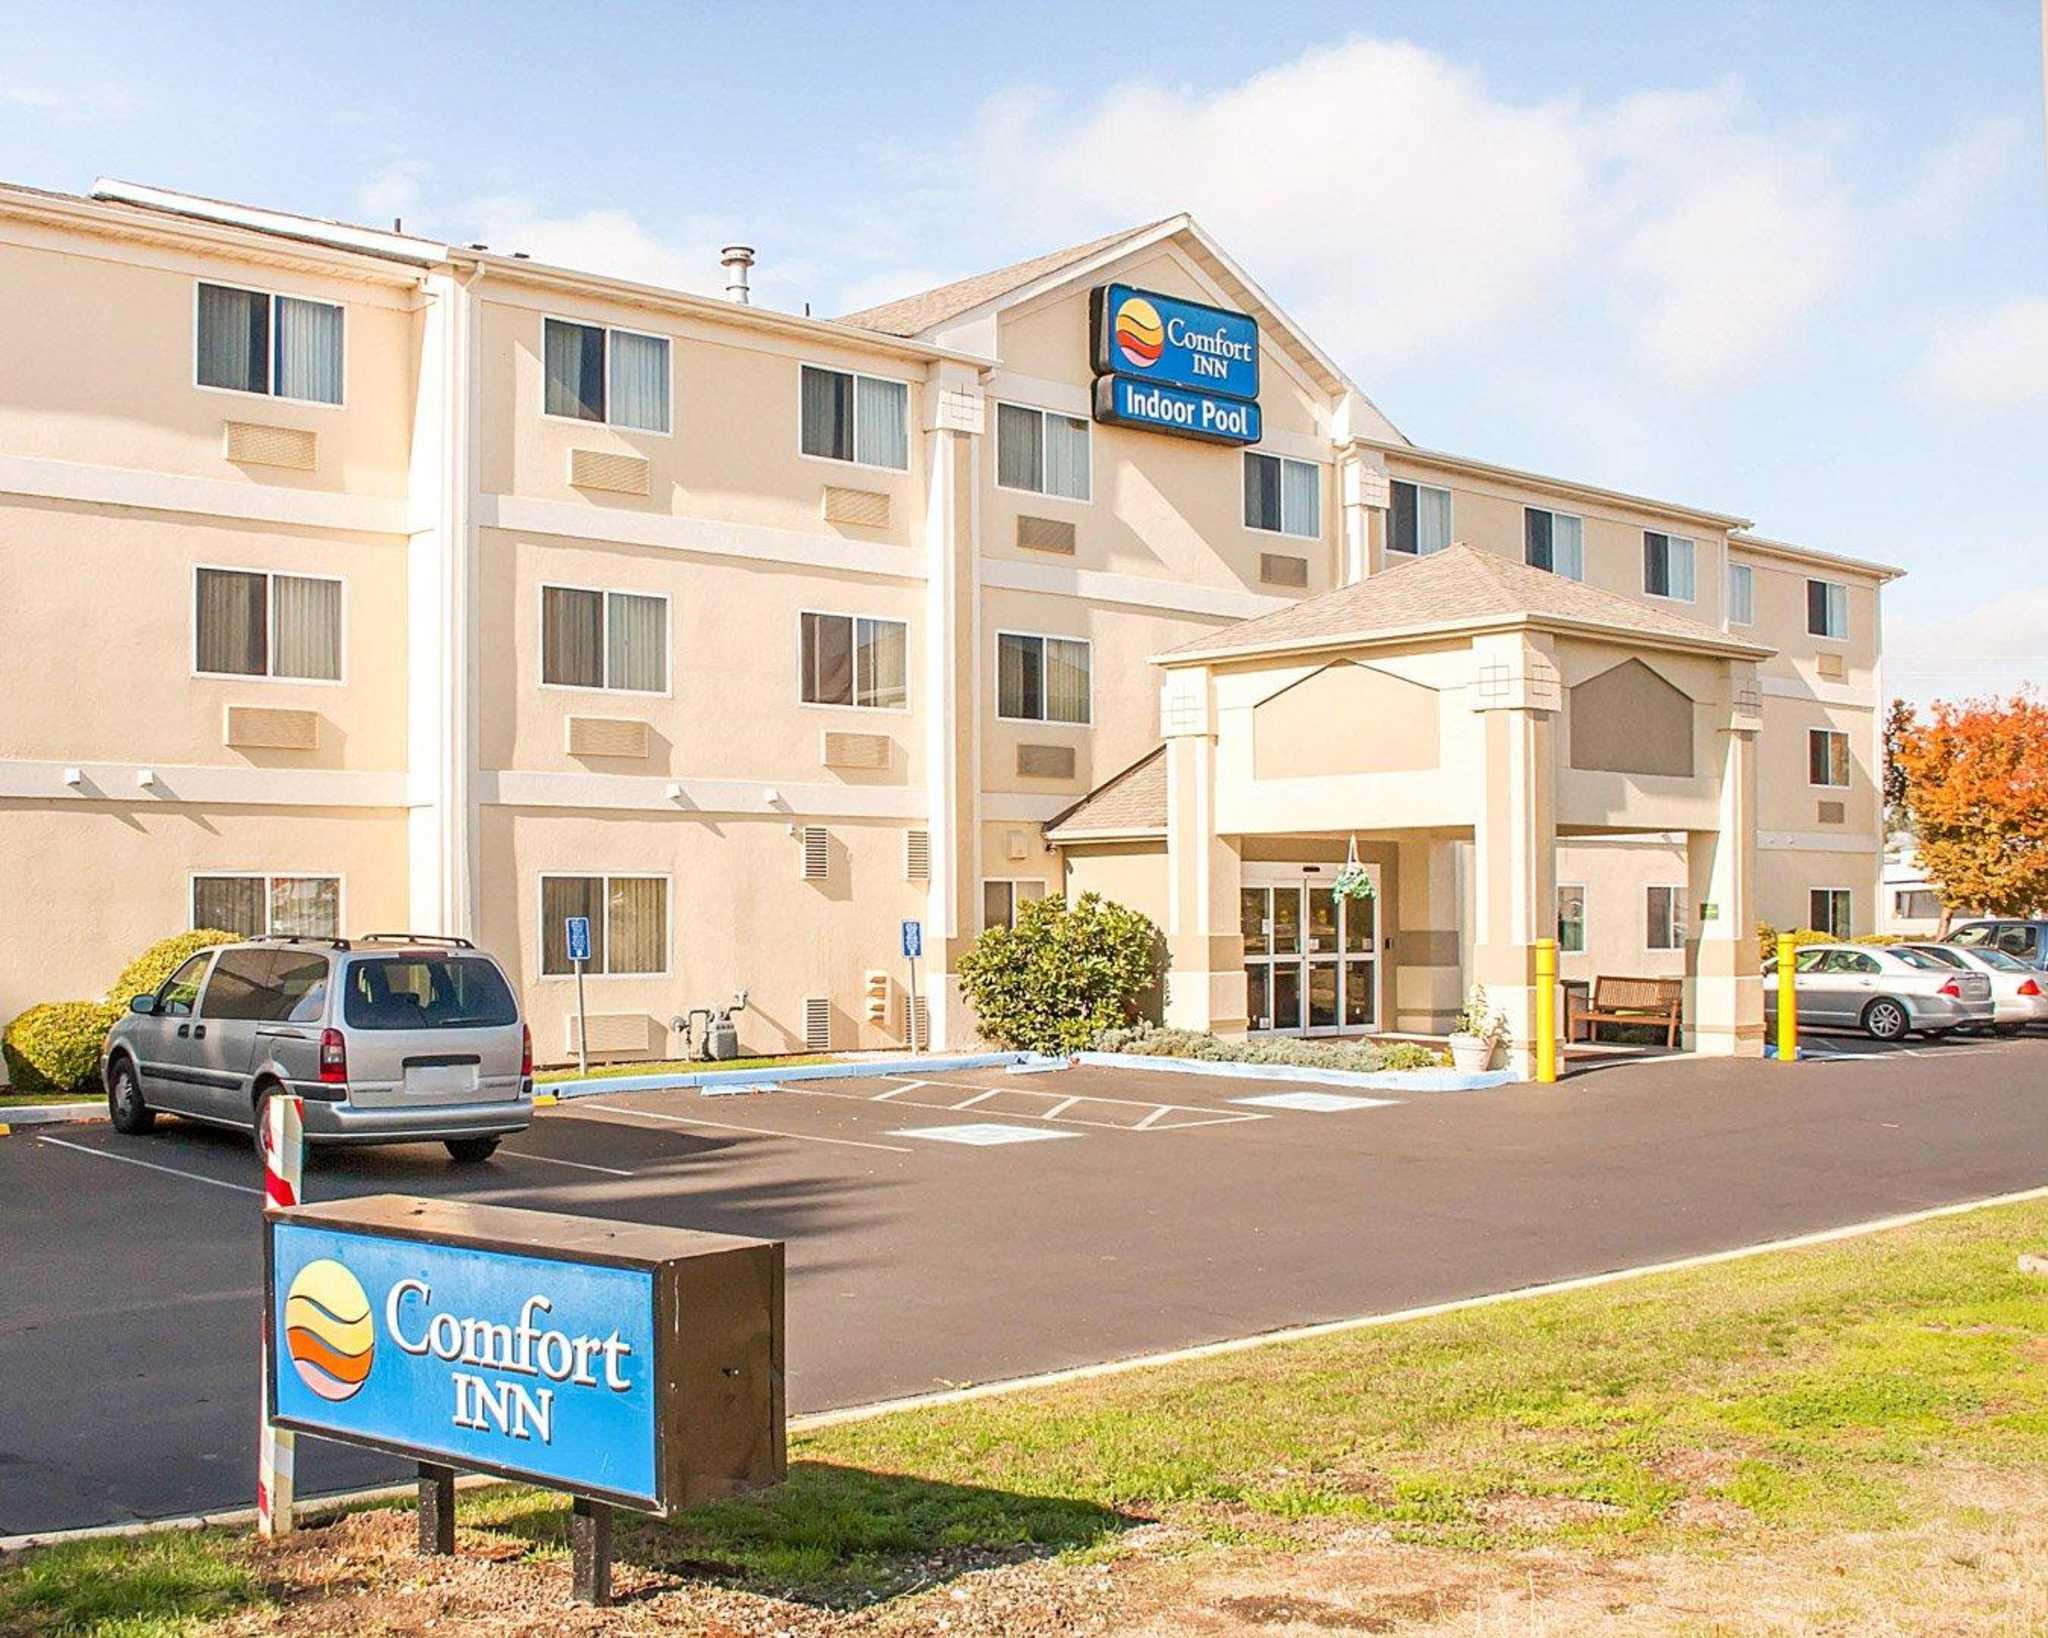 Comfort Inn North image 3